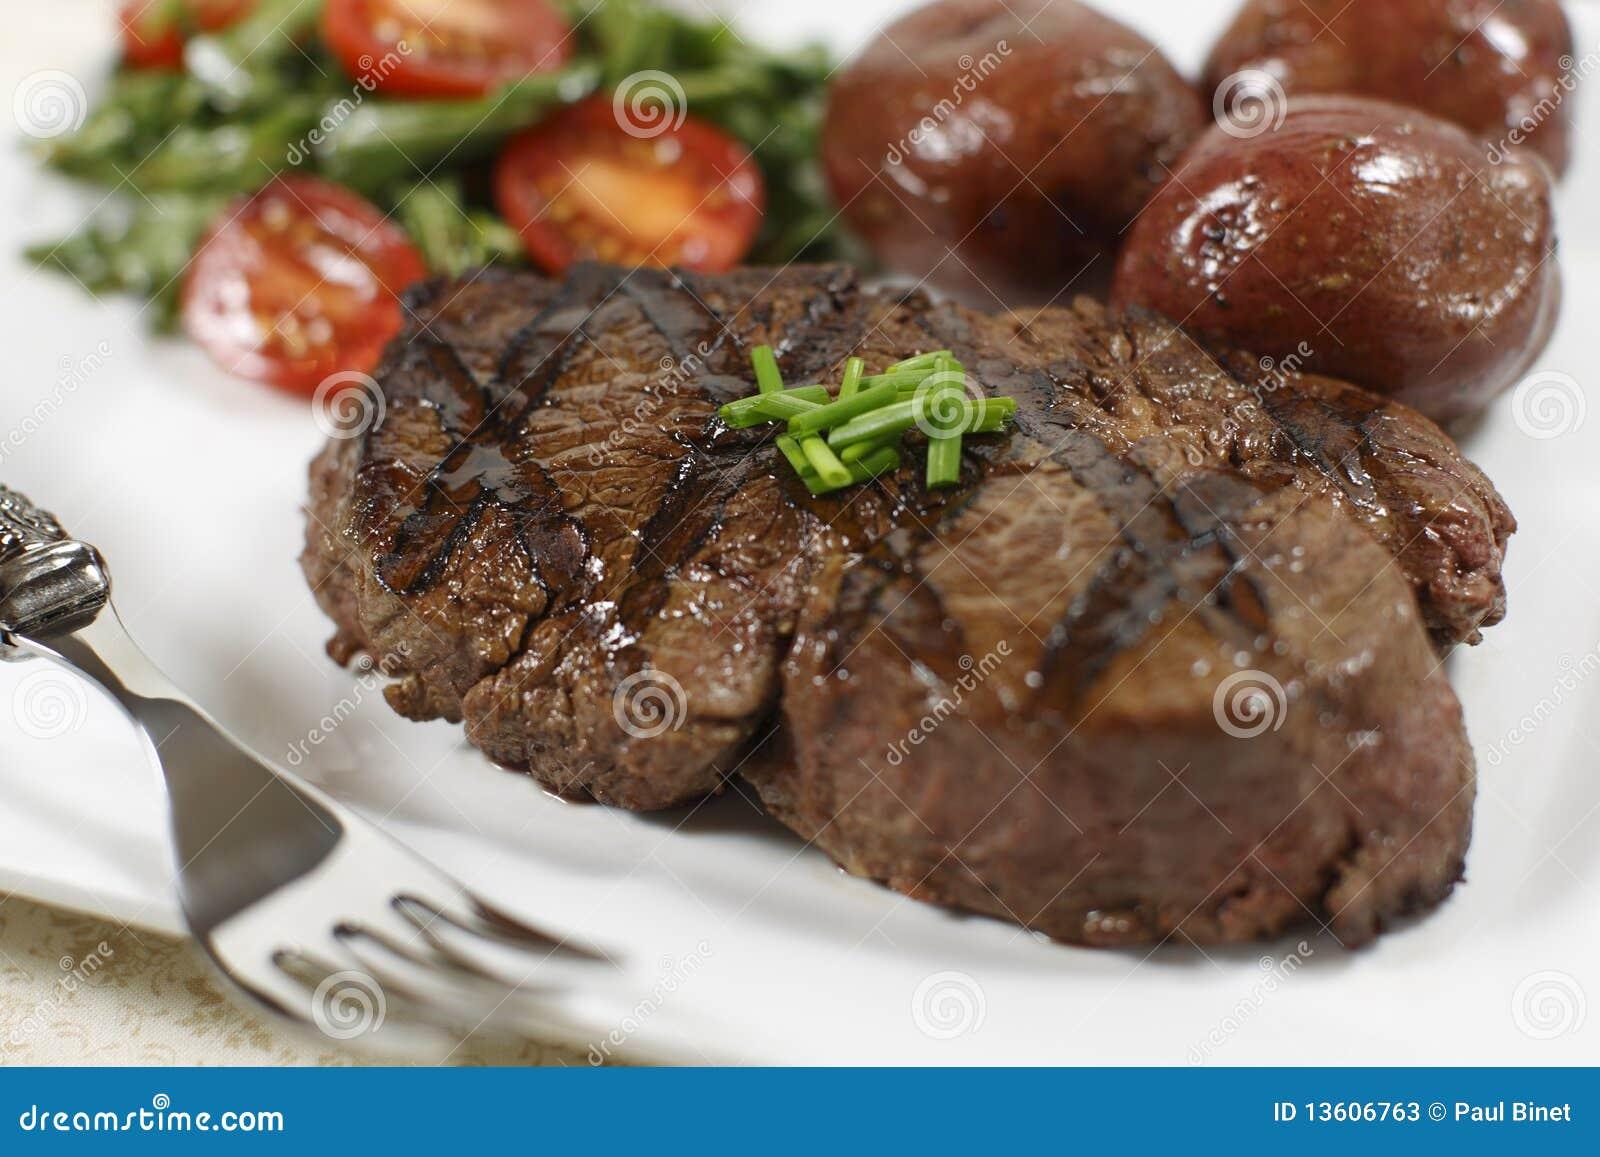 Filet mignon cooked